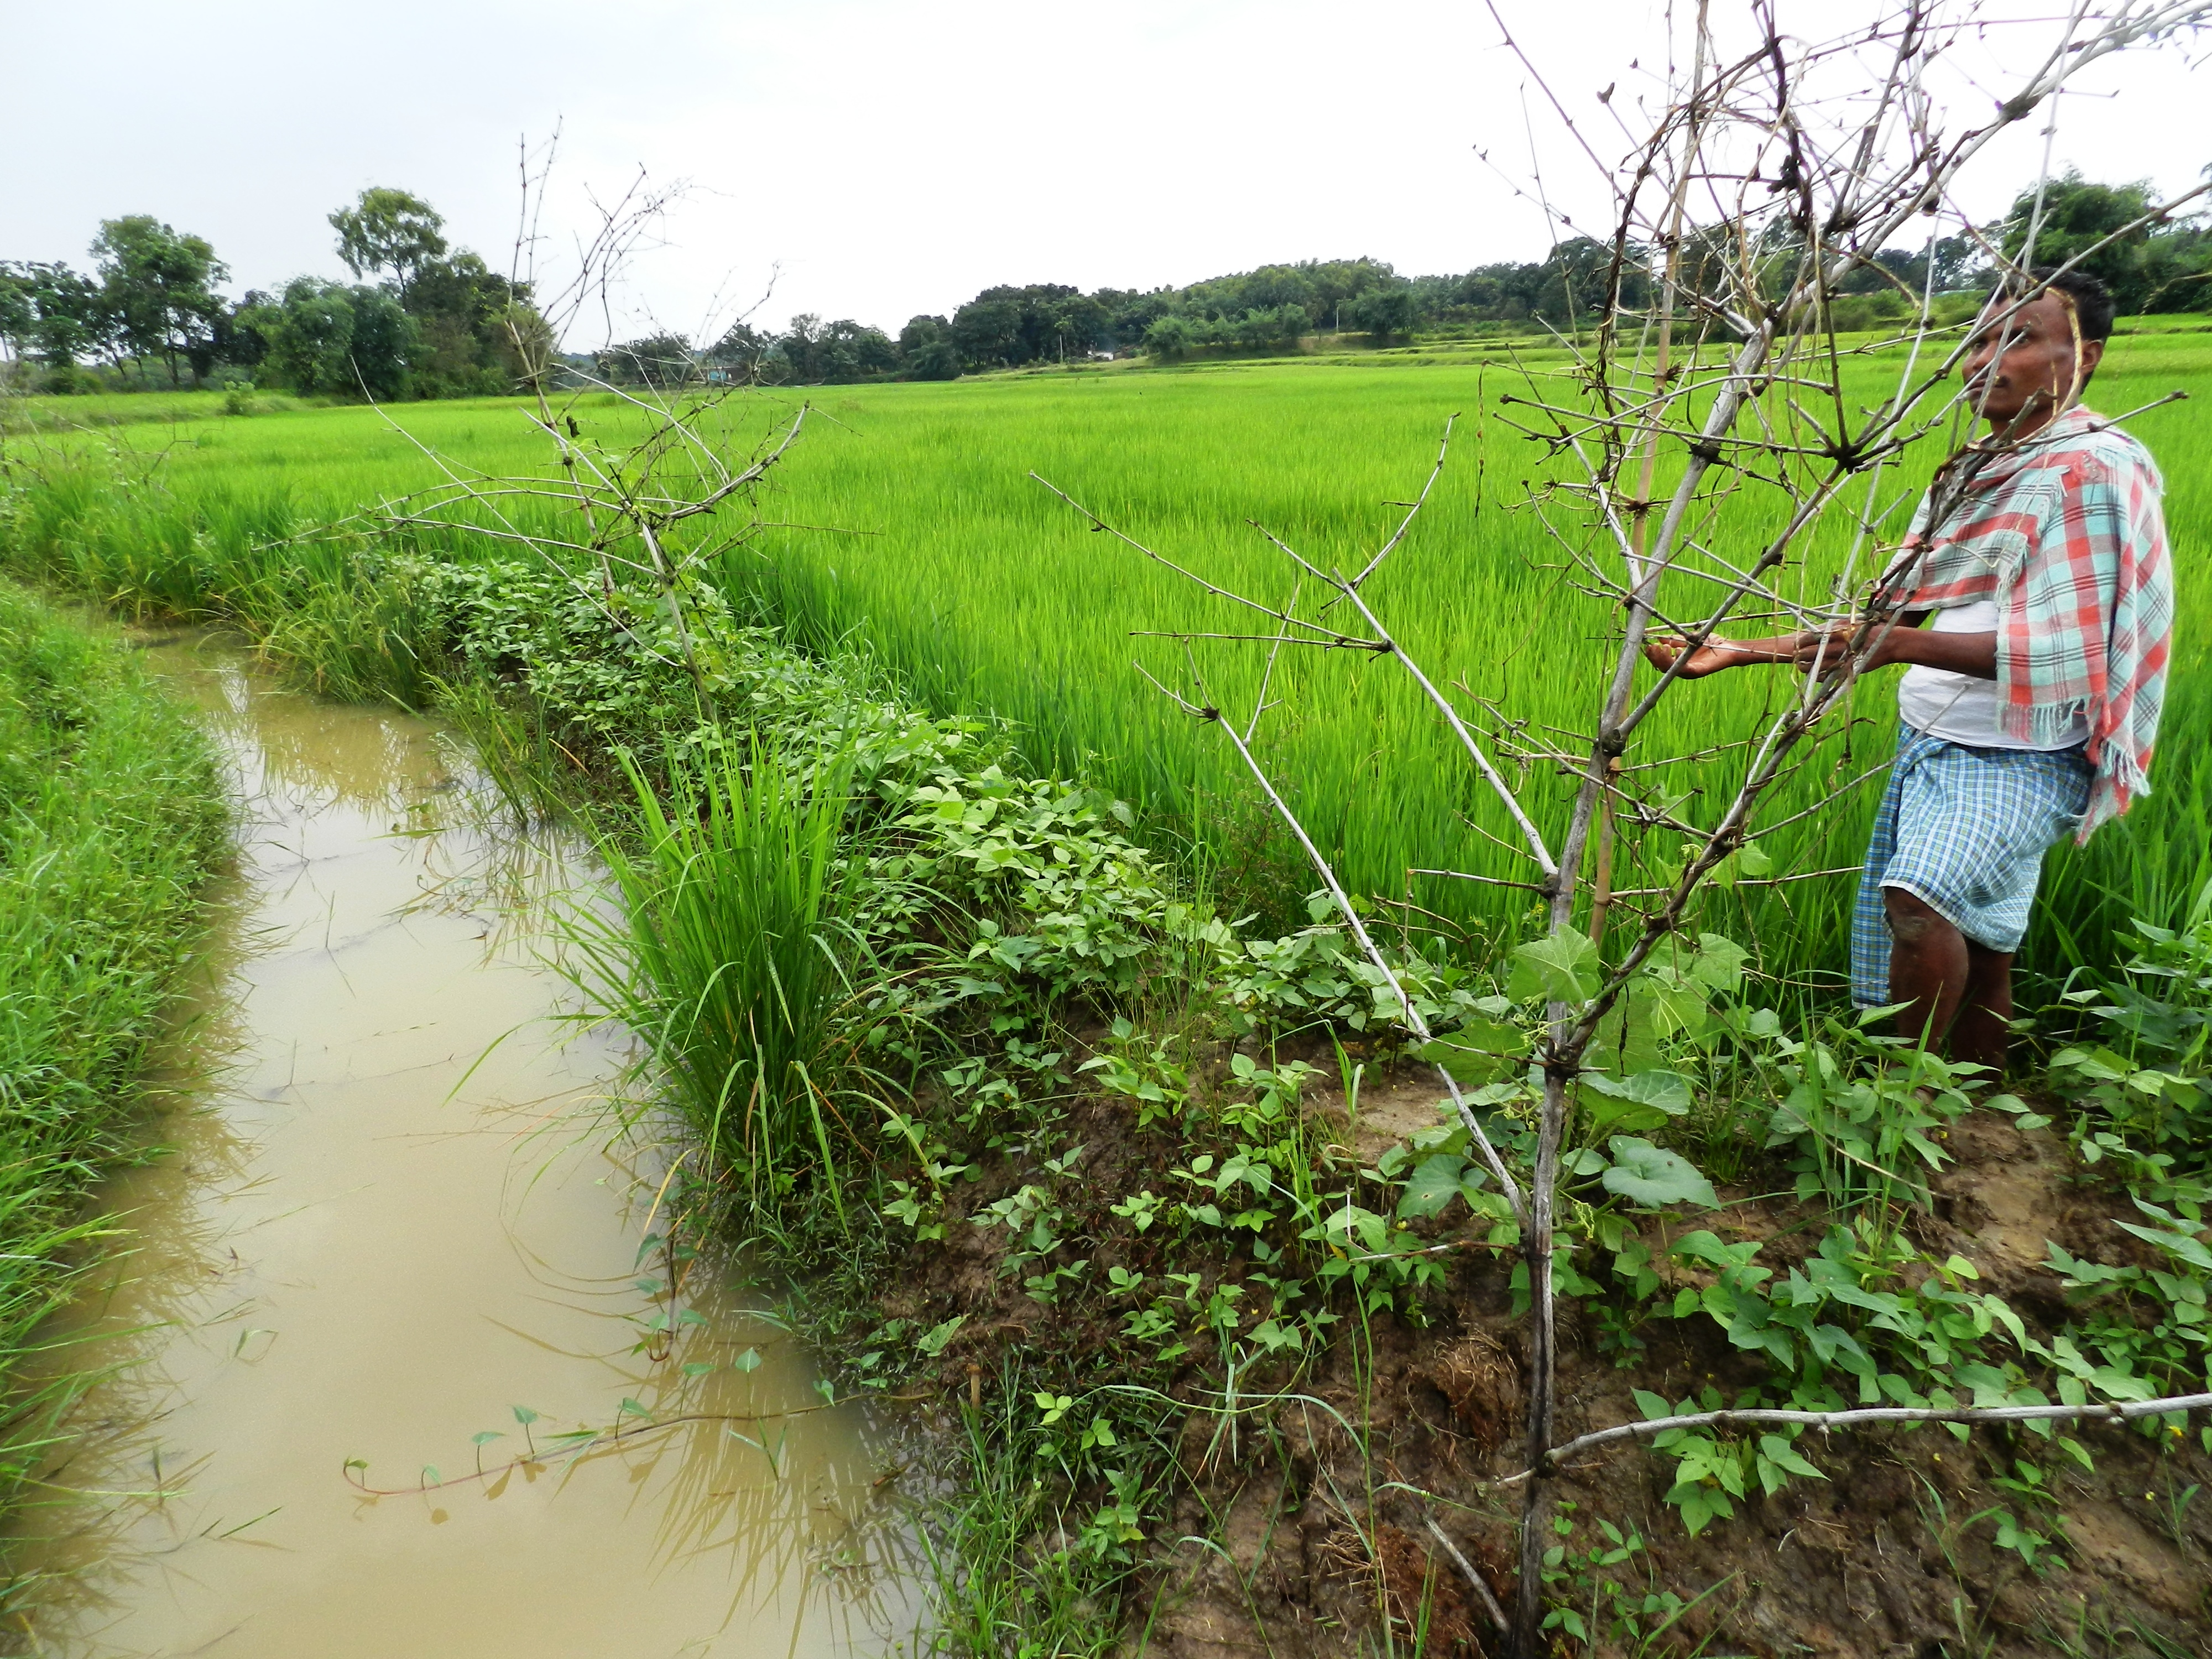 An integrated rice field near Ranchi